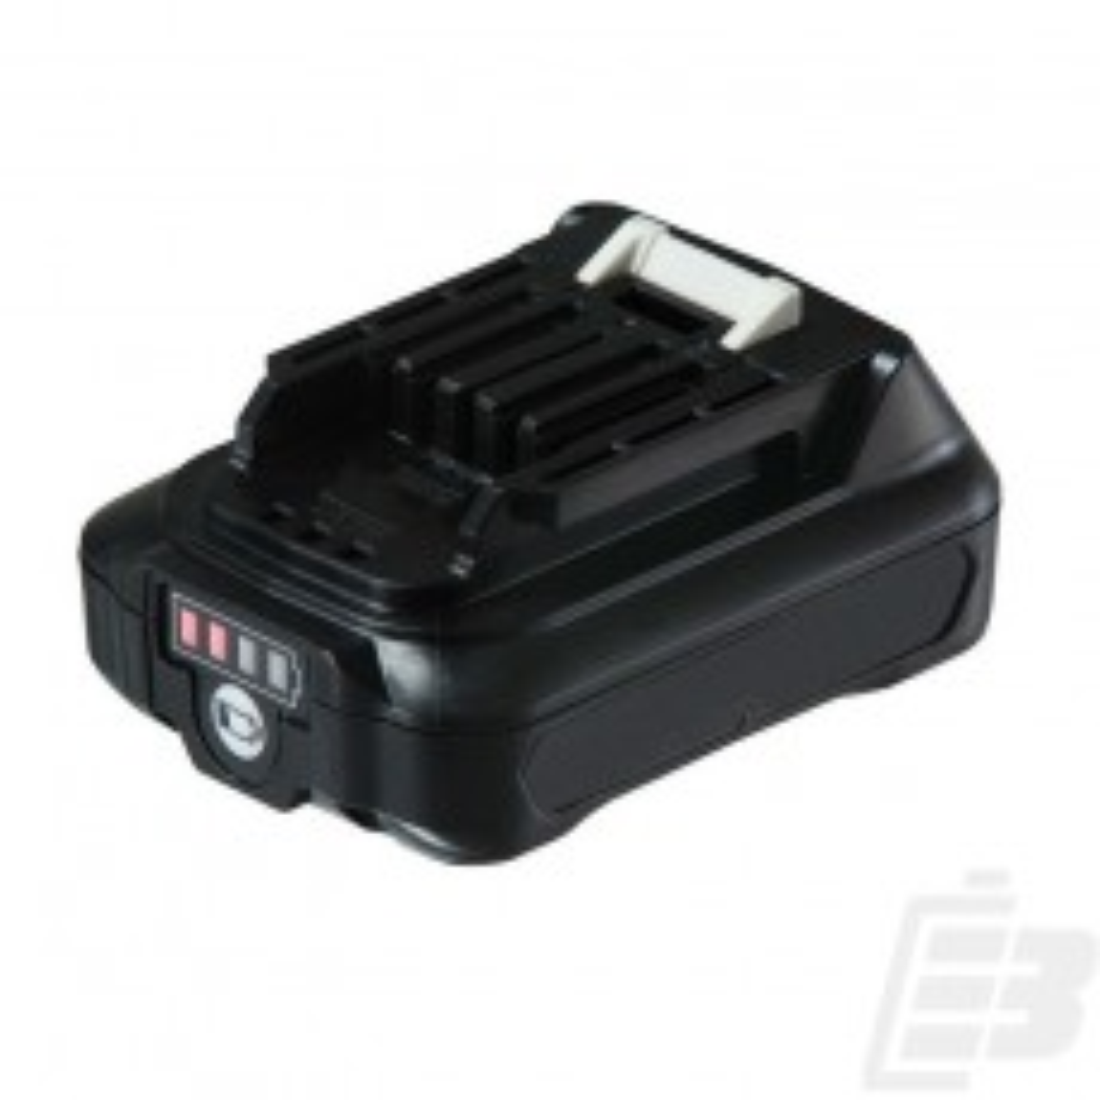 Power tool battery Makita 10.8V 2.0Ah BL1021B_1